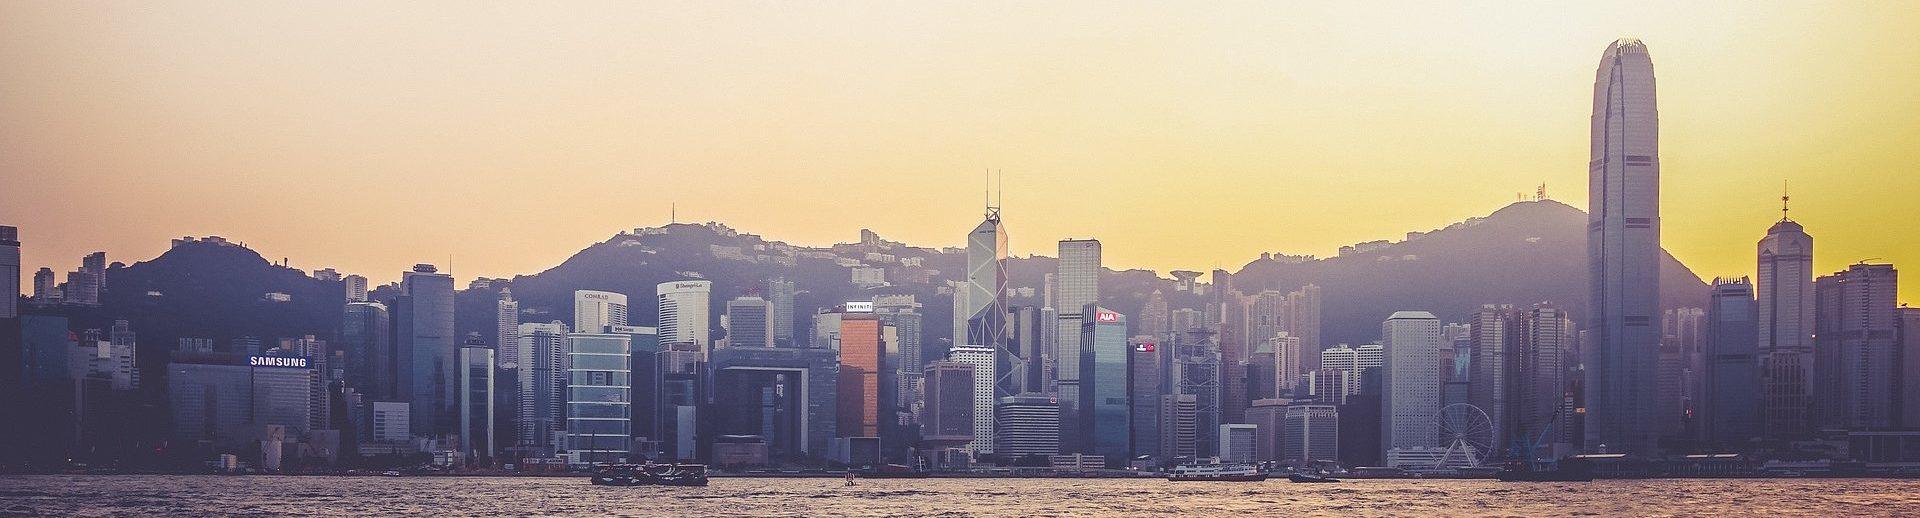 Hong Kong skyline - University of Hong Kong case study